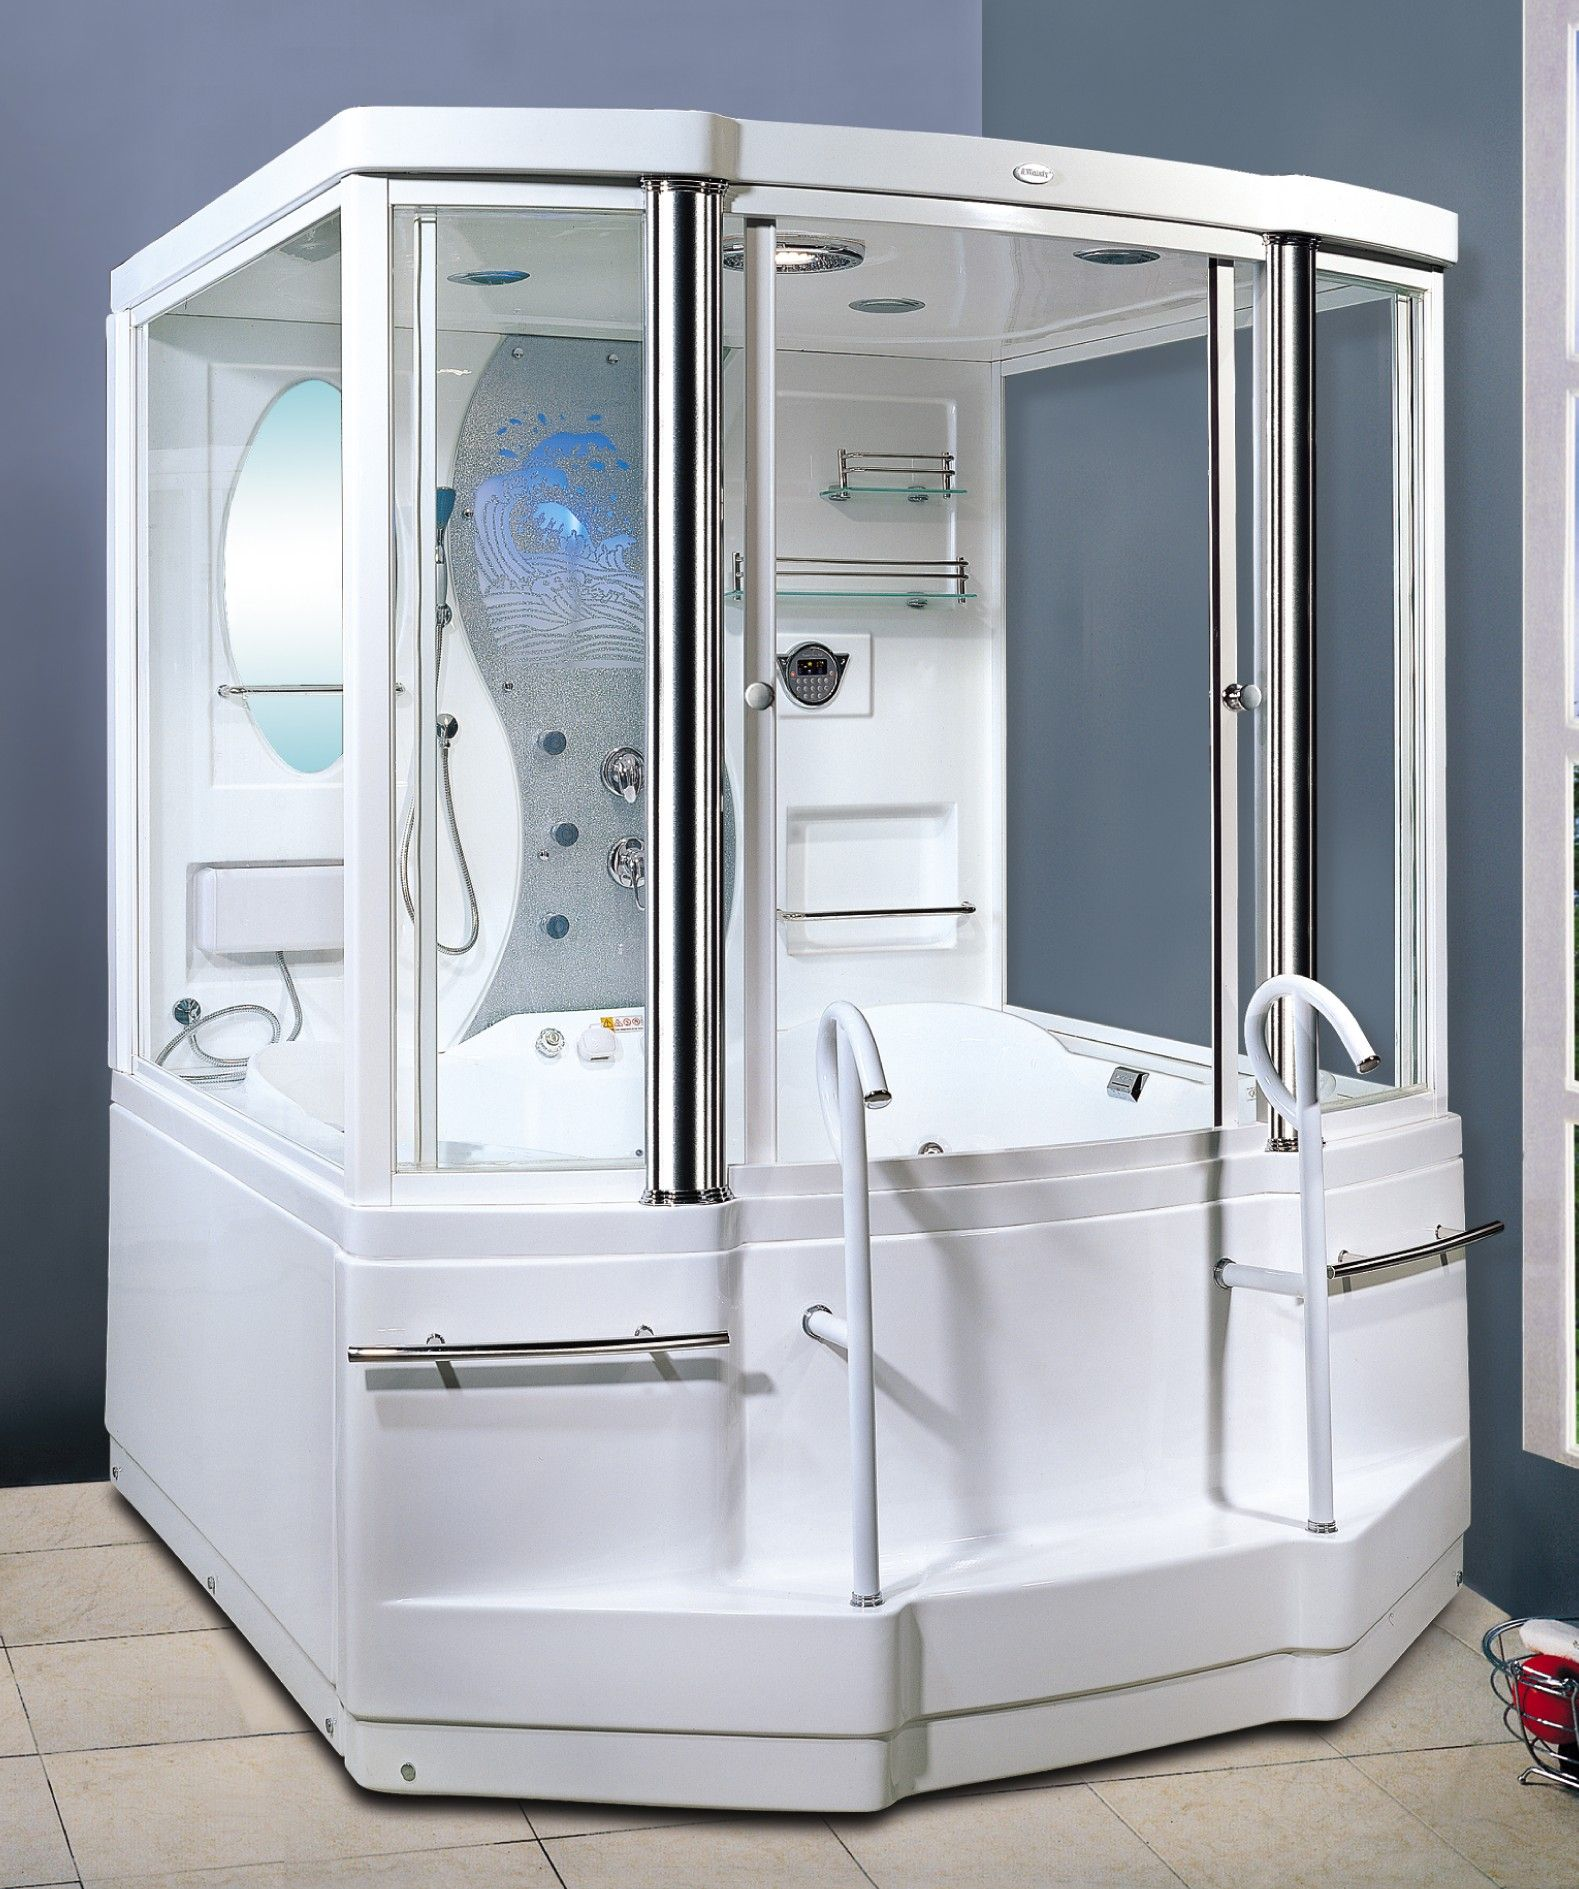 Cool Steam Shower Tub Also A Time Machine Thediyconsumer